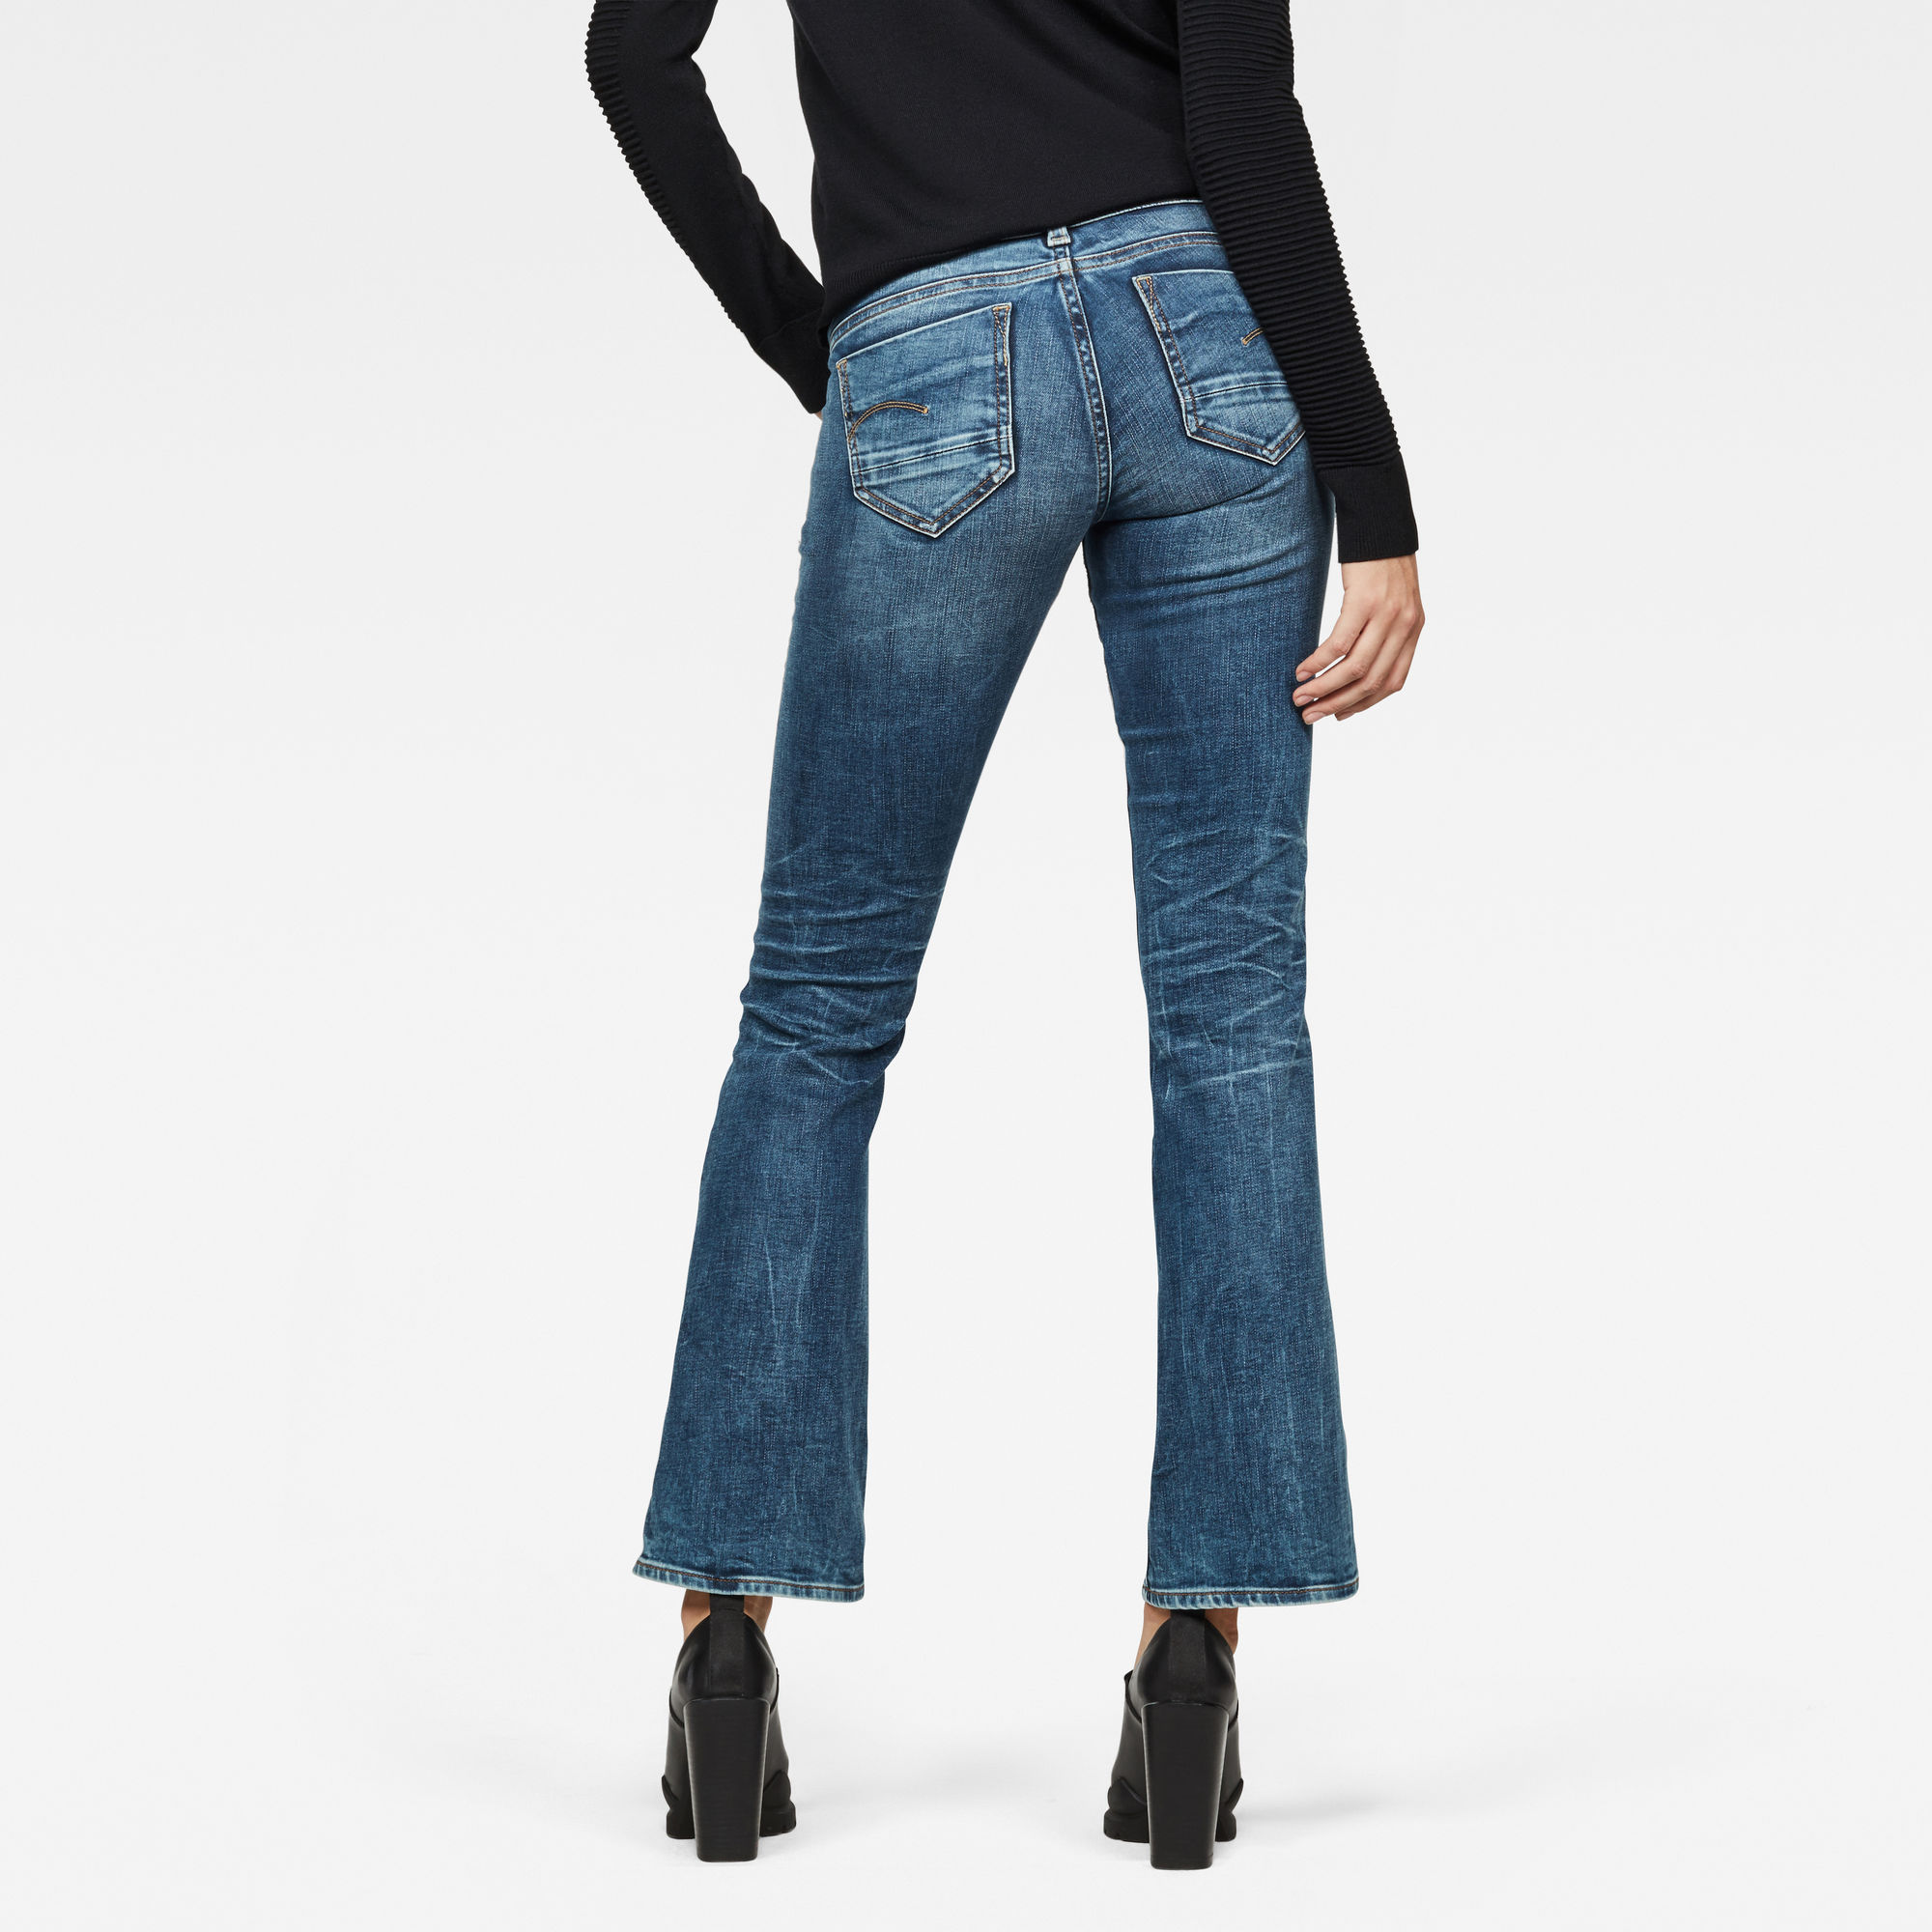 Midge Saddle Mid Skinny Bootcut Jeans Jeans maat 27-28 van G-Star RAW snel en voordelig in huis? Hier lukt het direct